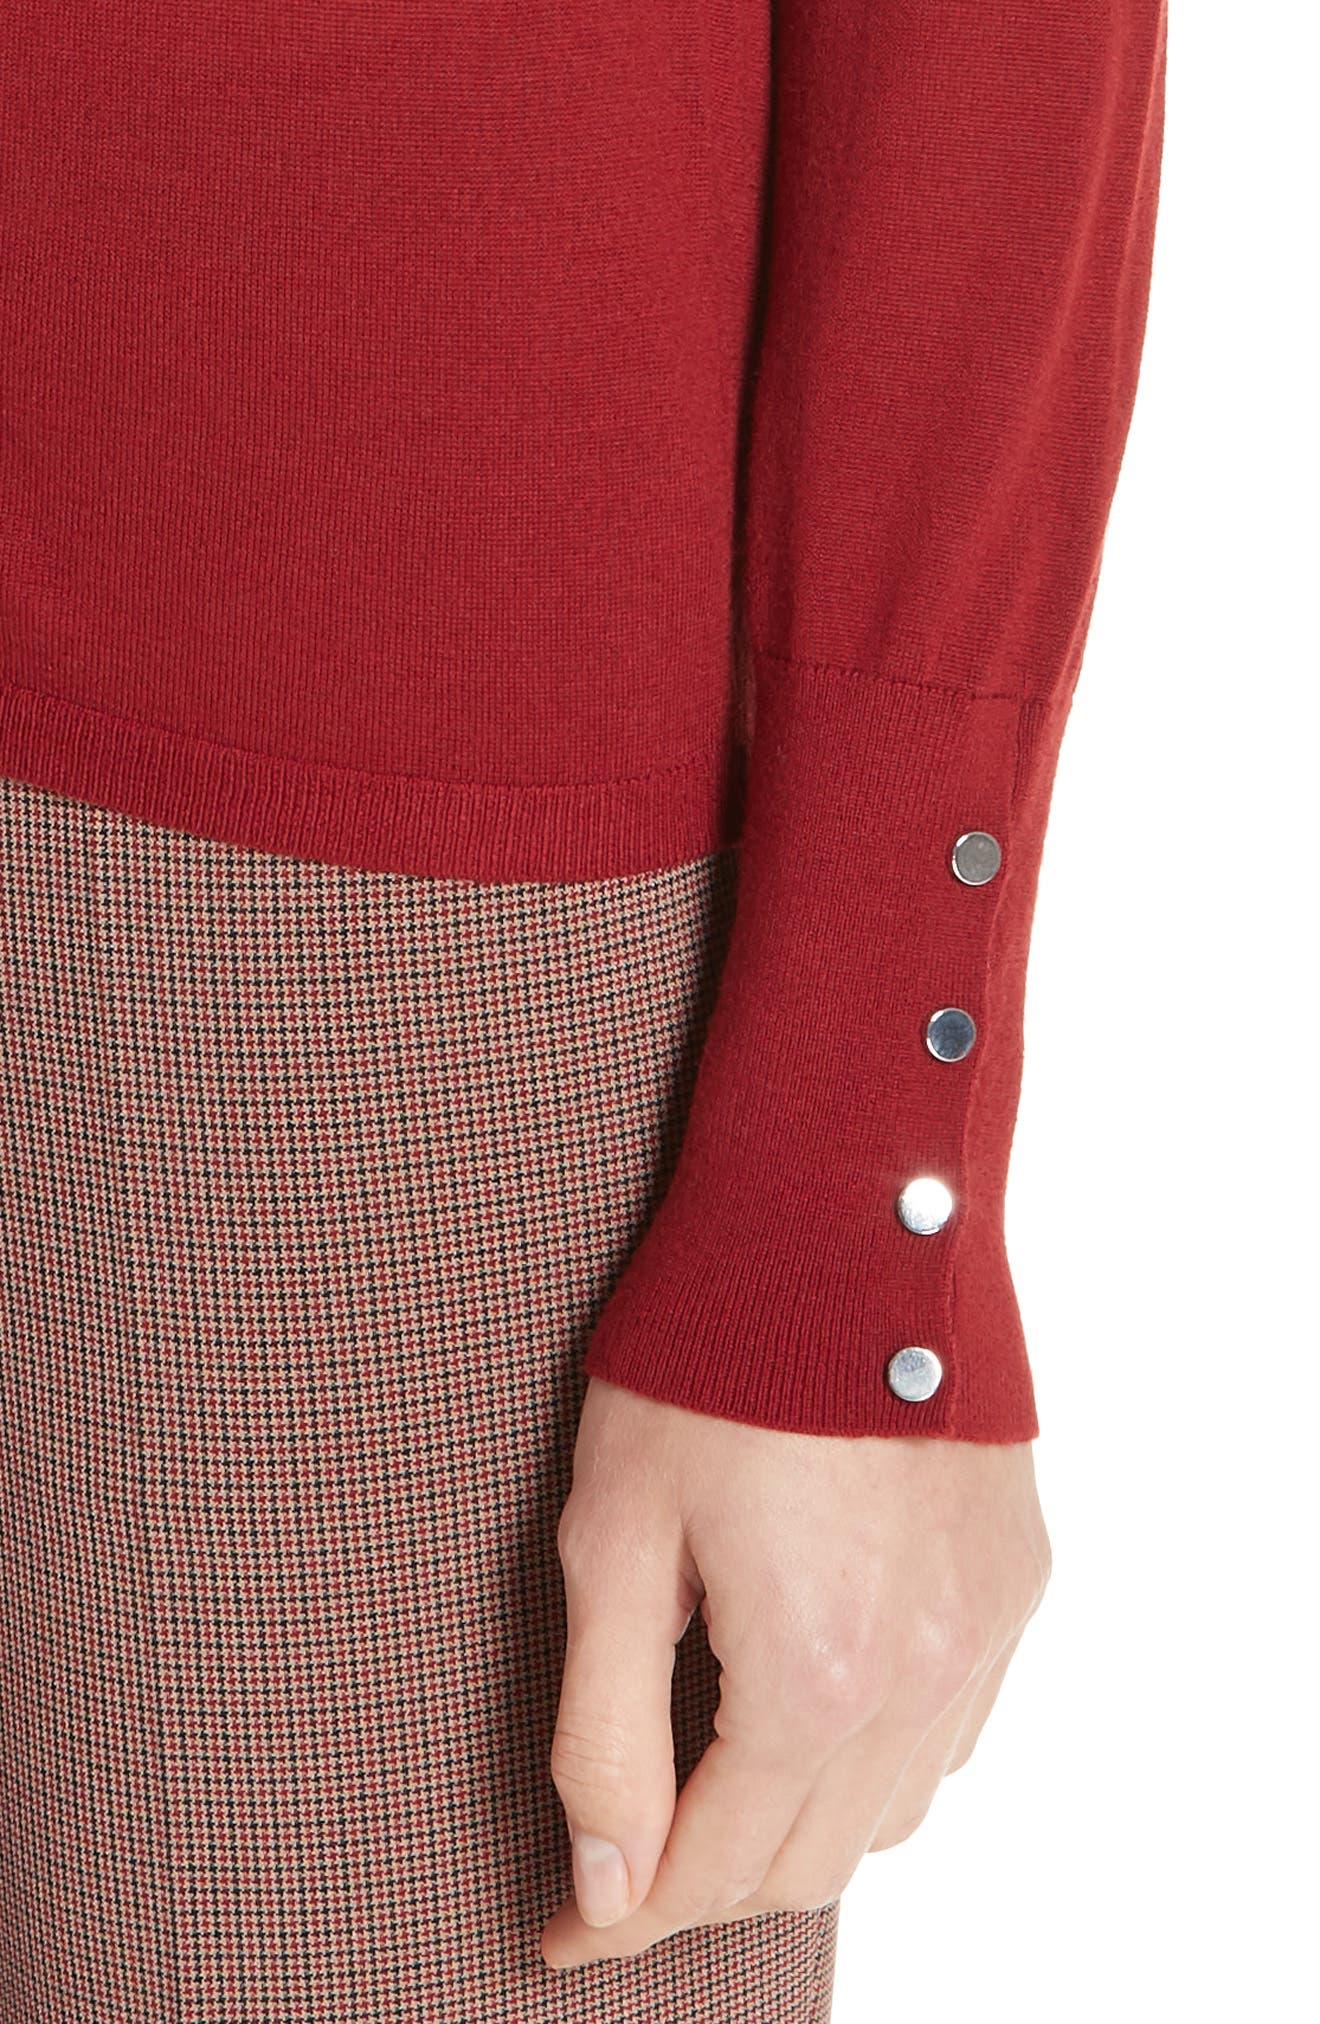 Frankie Cuff Detail Wool Sweater,                             Alternate thumbnail 4, color,                             DARK RED